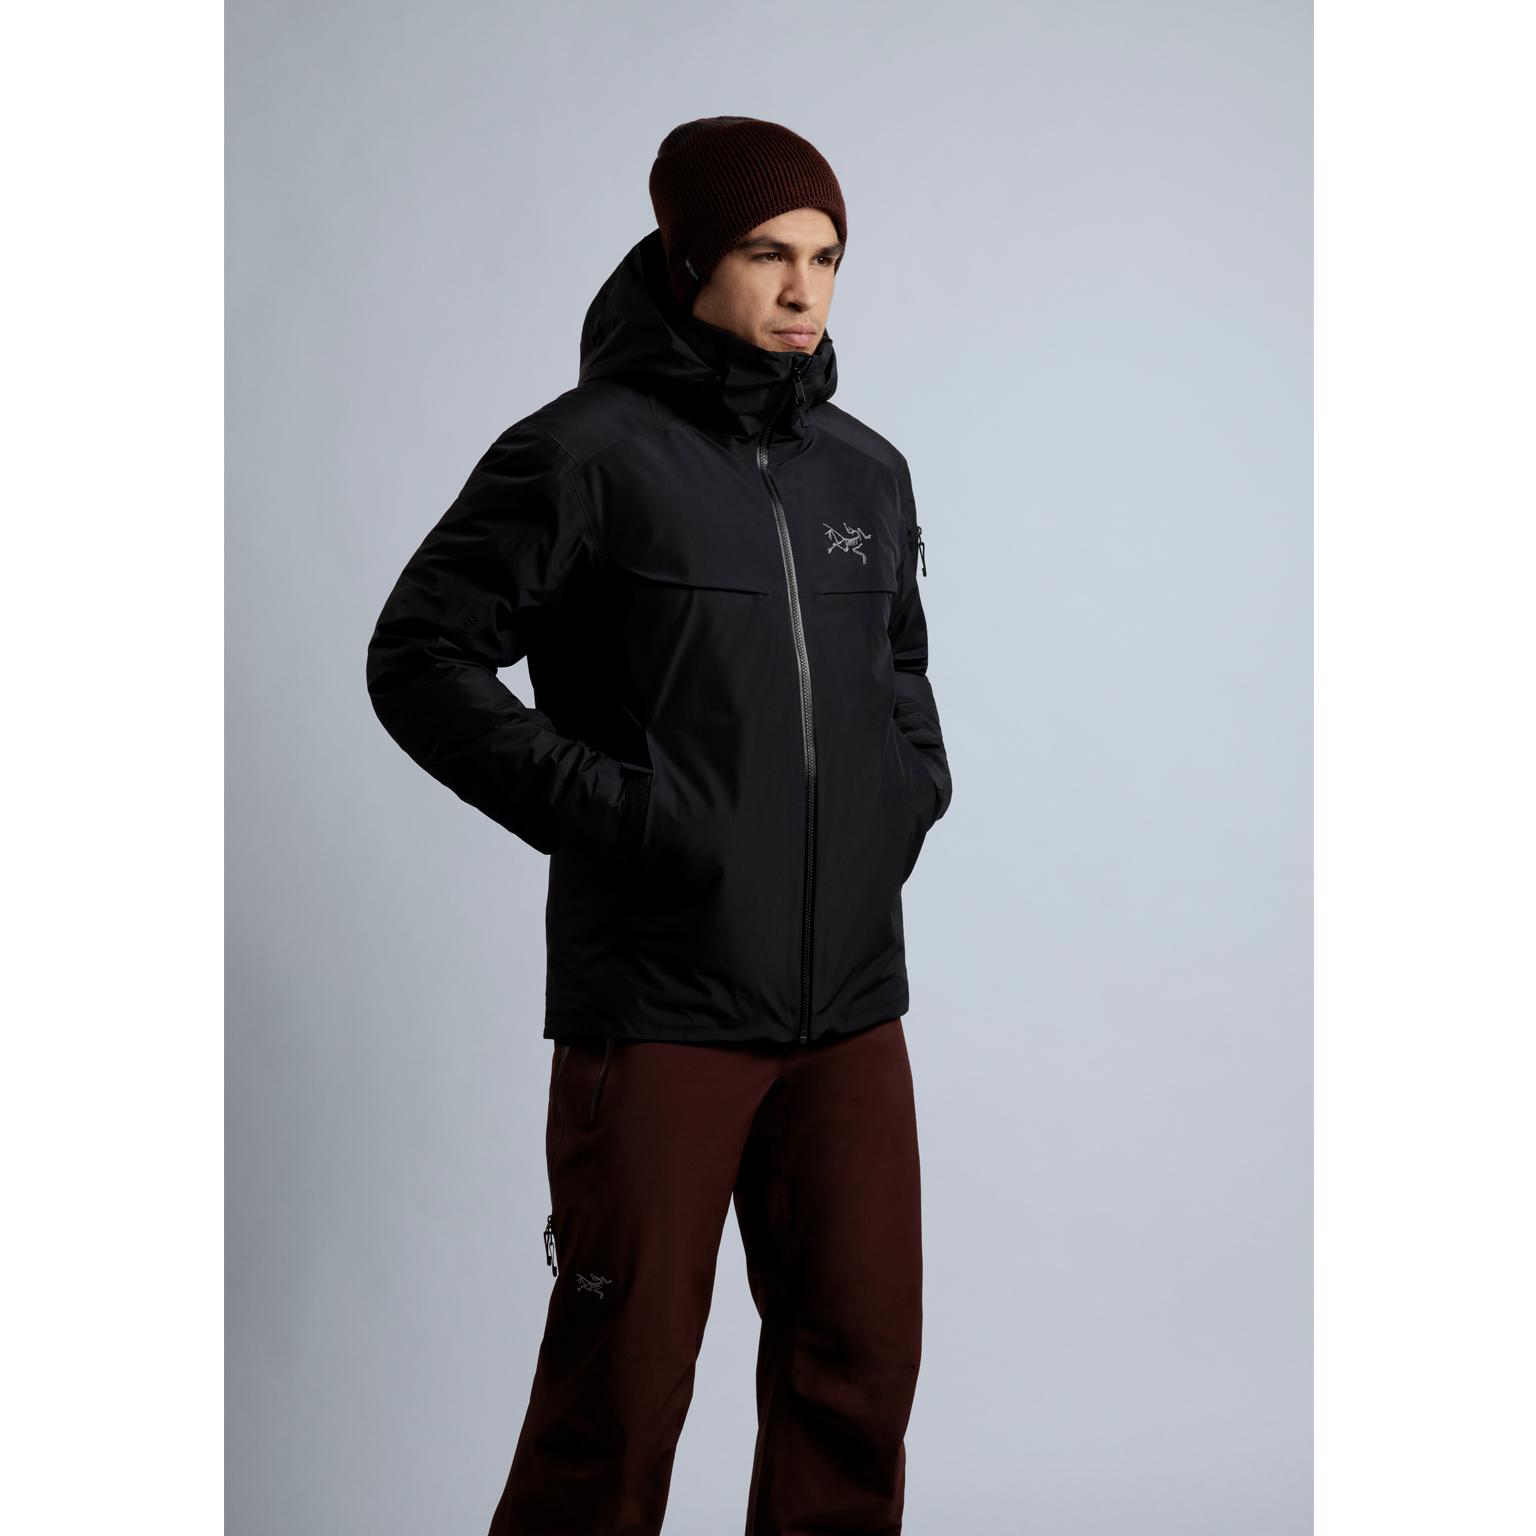 Toronto-Fitness-Model-Agency-Acrteryx-Commercial-Juan-Osorio